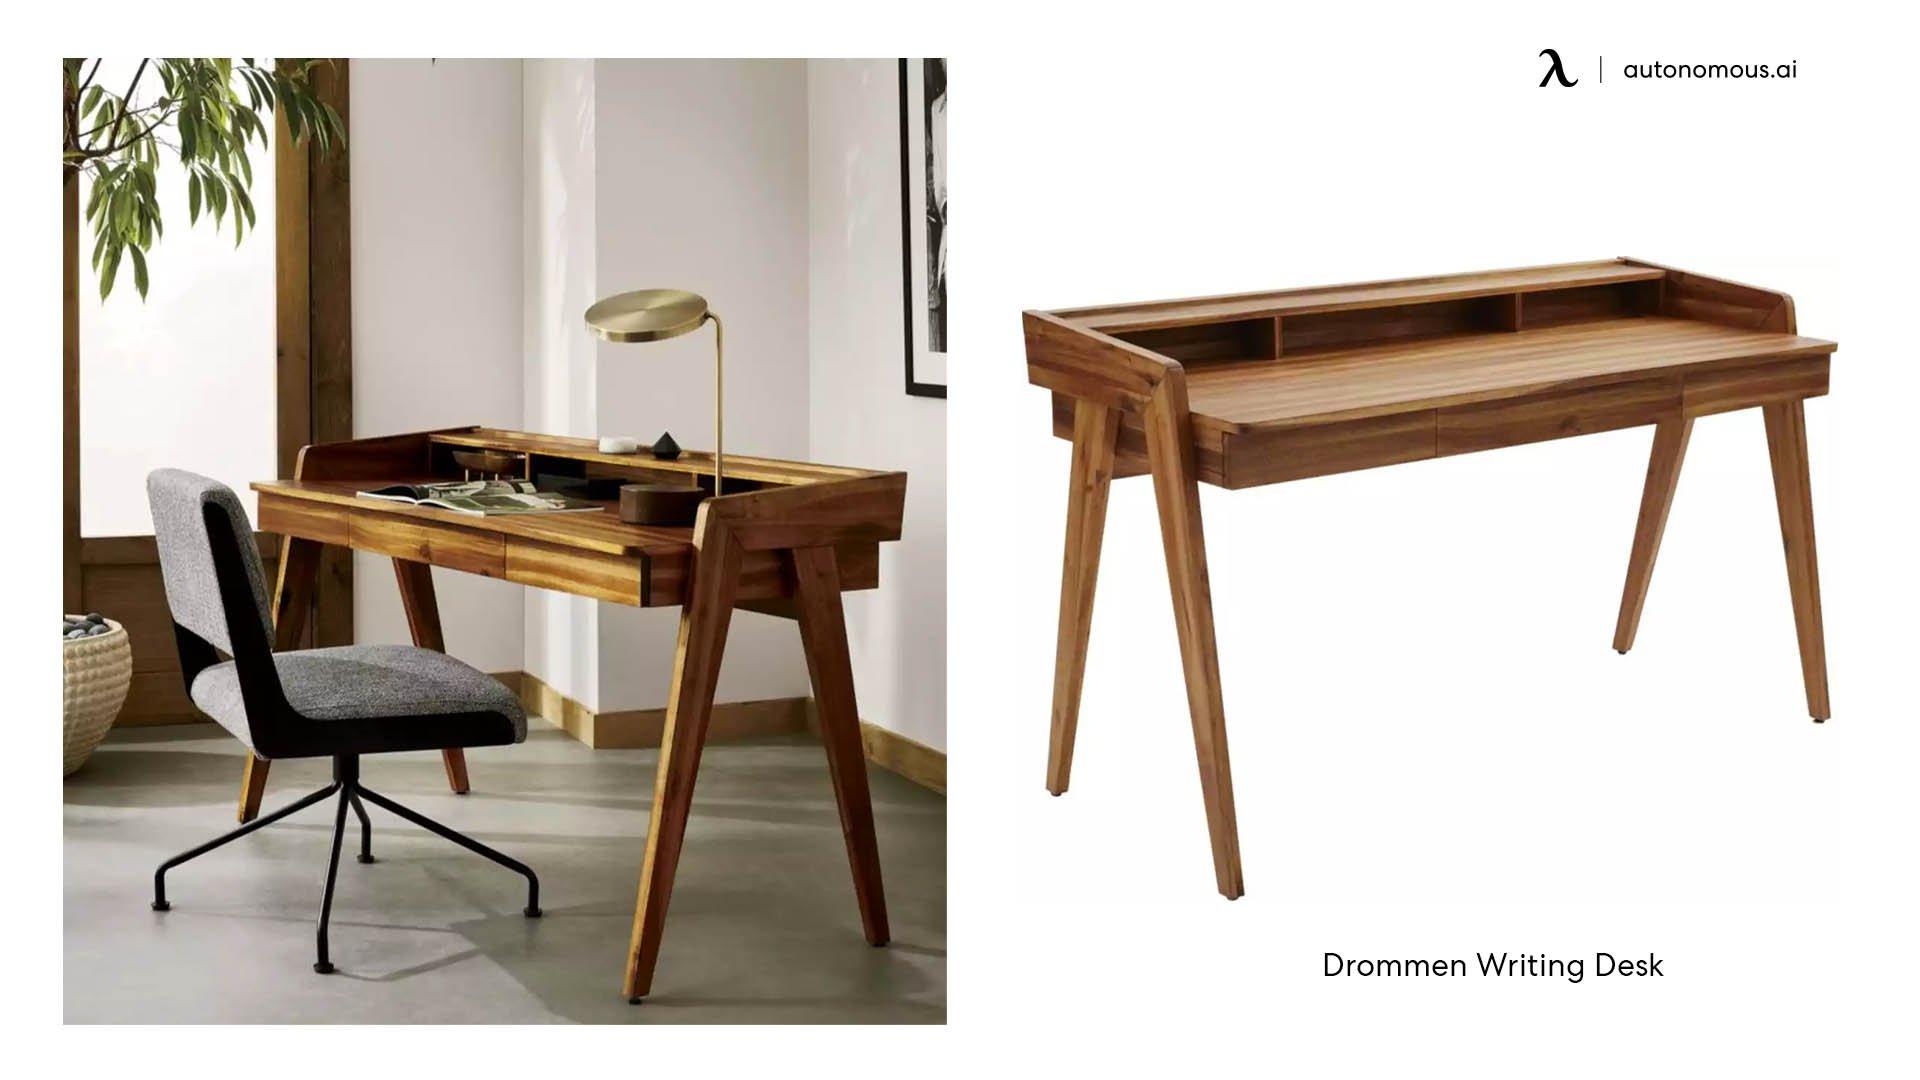 Drommen Writing Desk